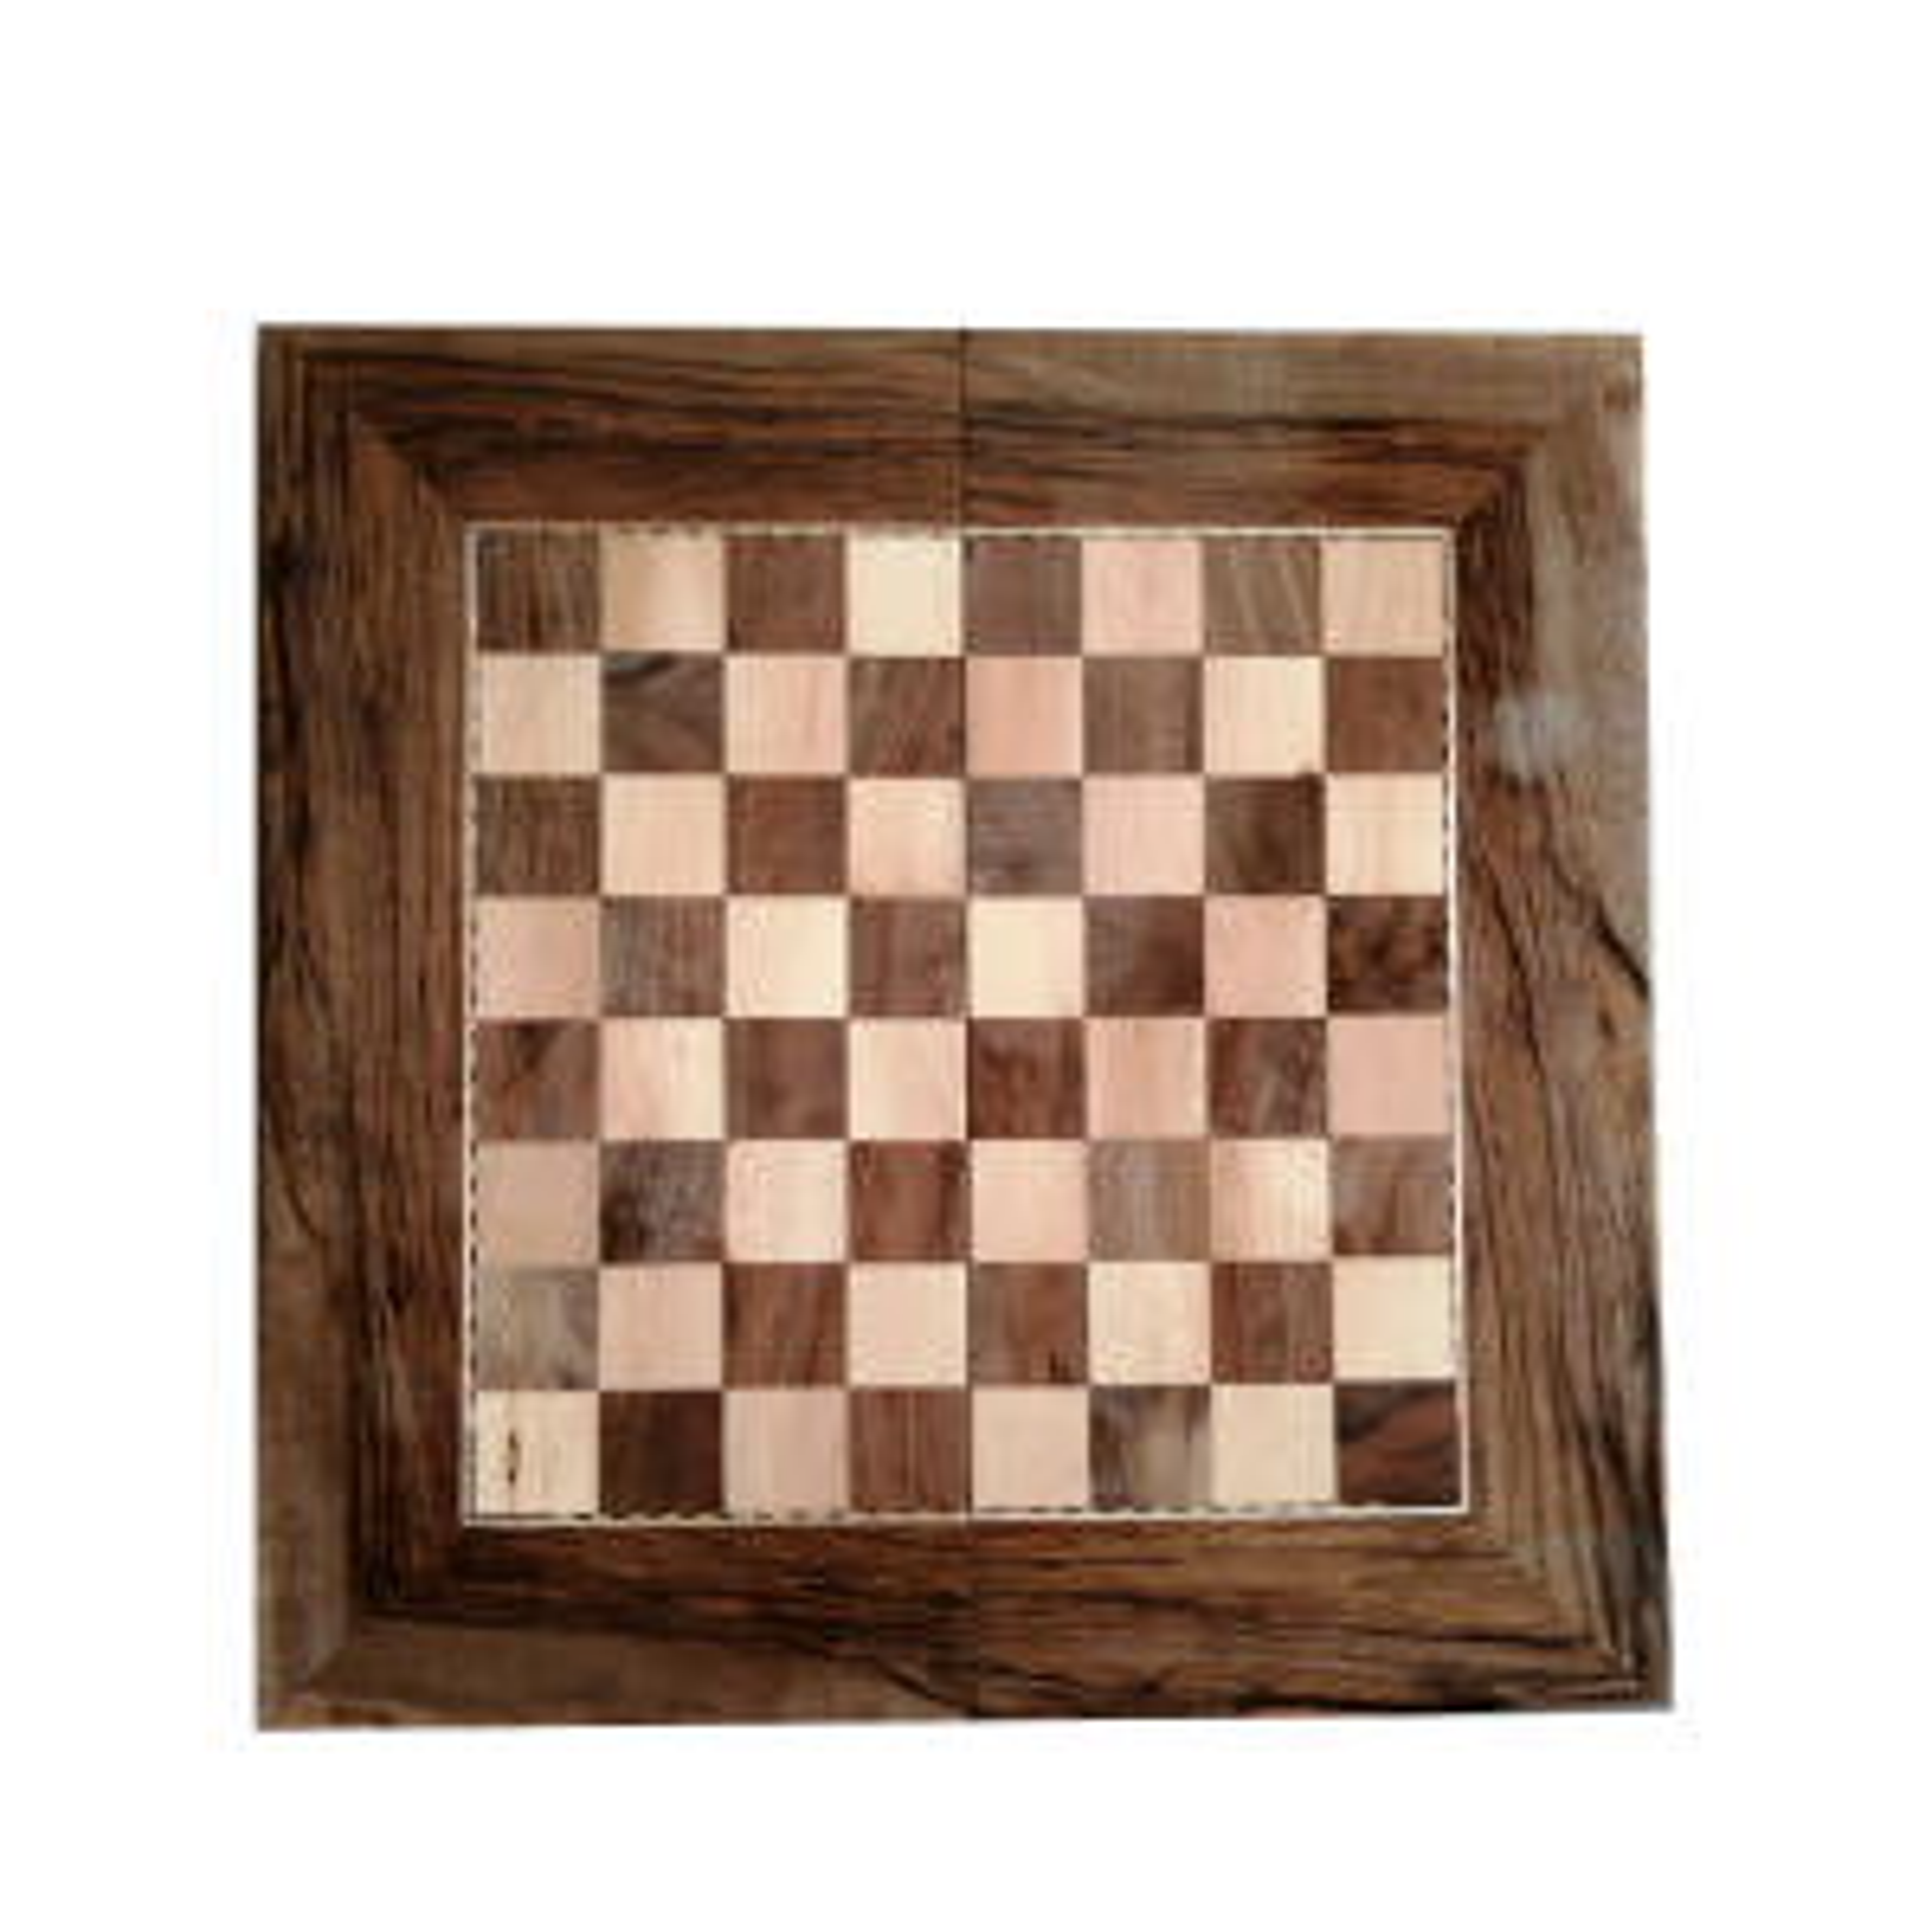 صفحه شطرنج مدل لوکس لایف3